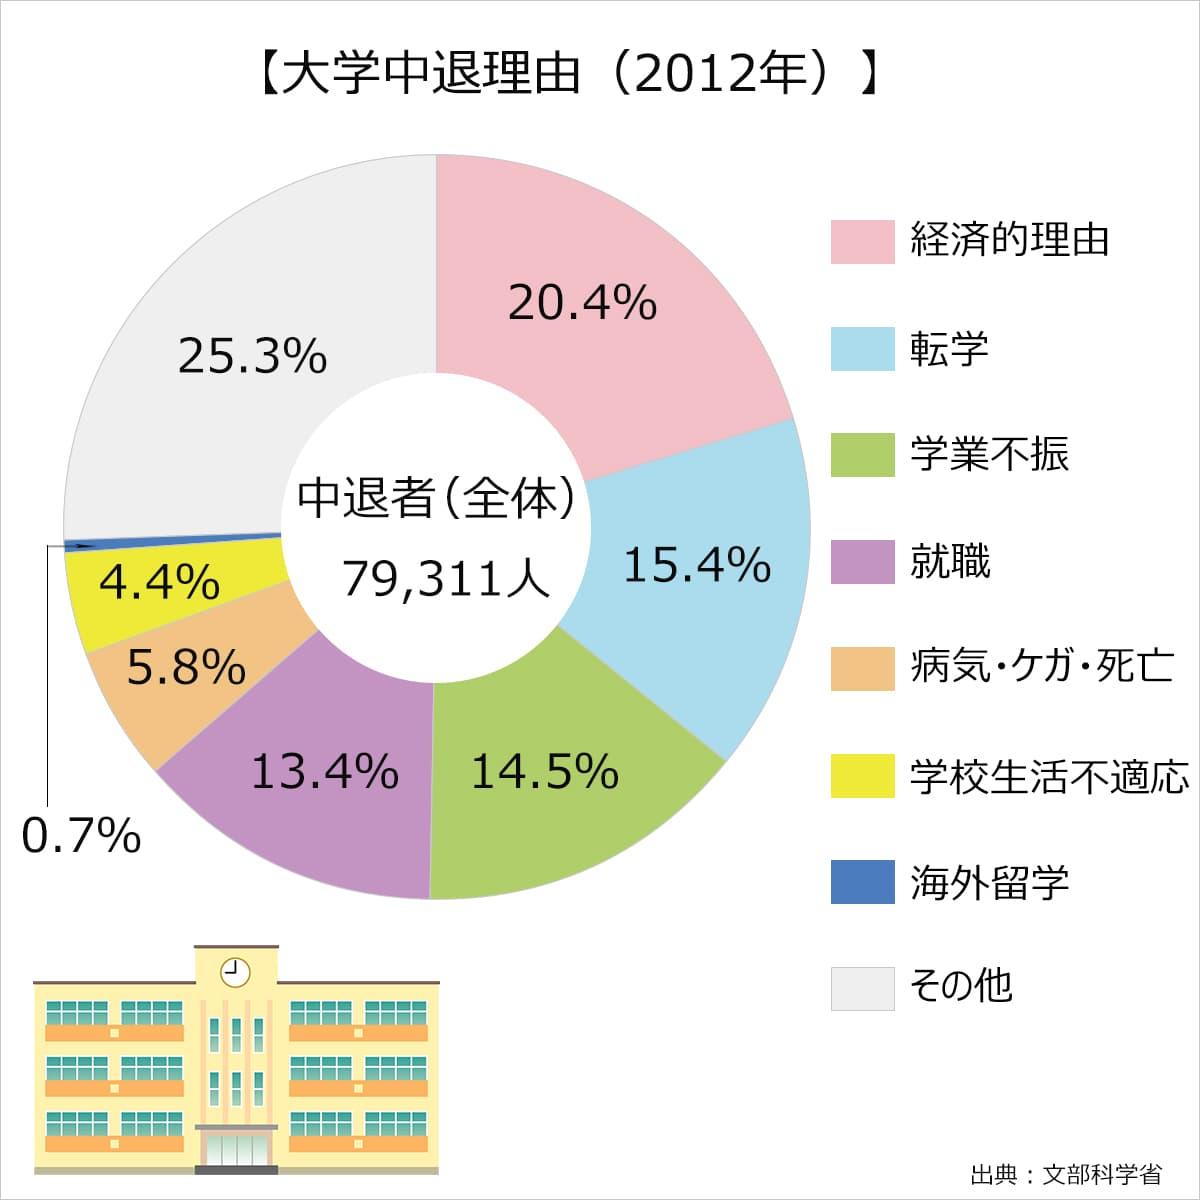 2012年の大学中退理由。学業不振:14.5%、学校生活不適応:4.4%、就職:13.4%、転学:15.4%、海外留学:0.7%、病気・けが・死亡:5.8%、経済的理由:20.4%、その他:25.3%